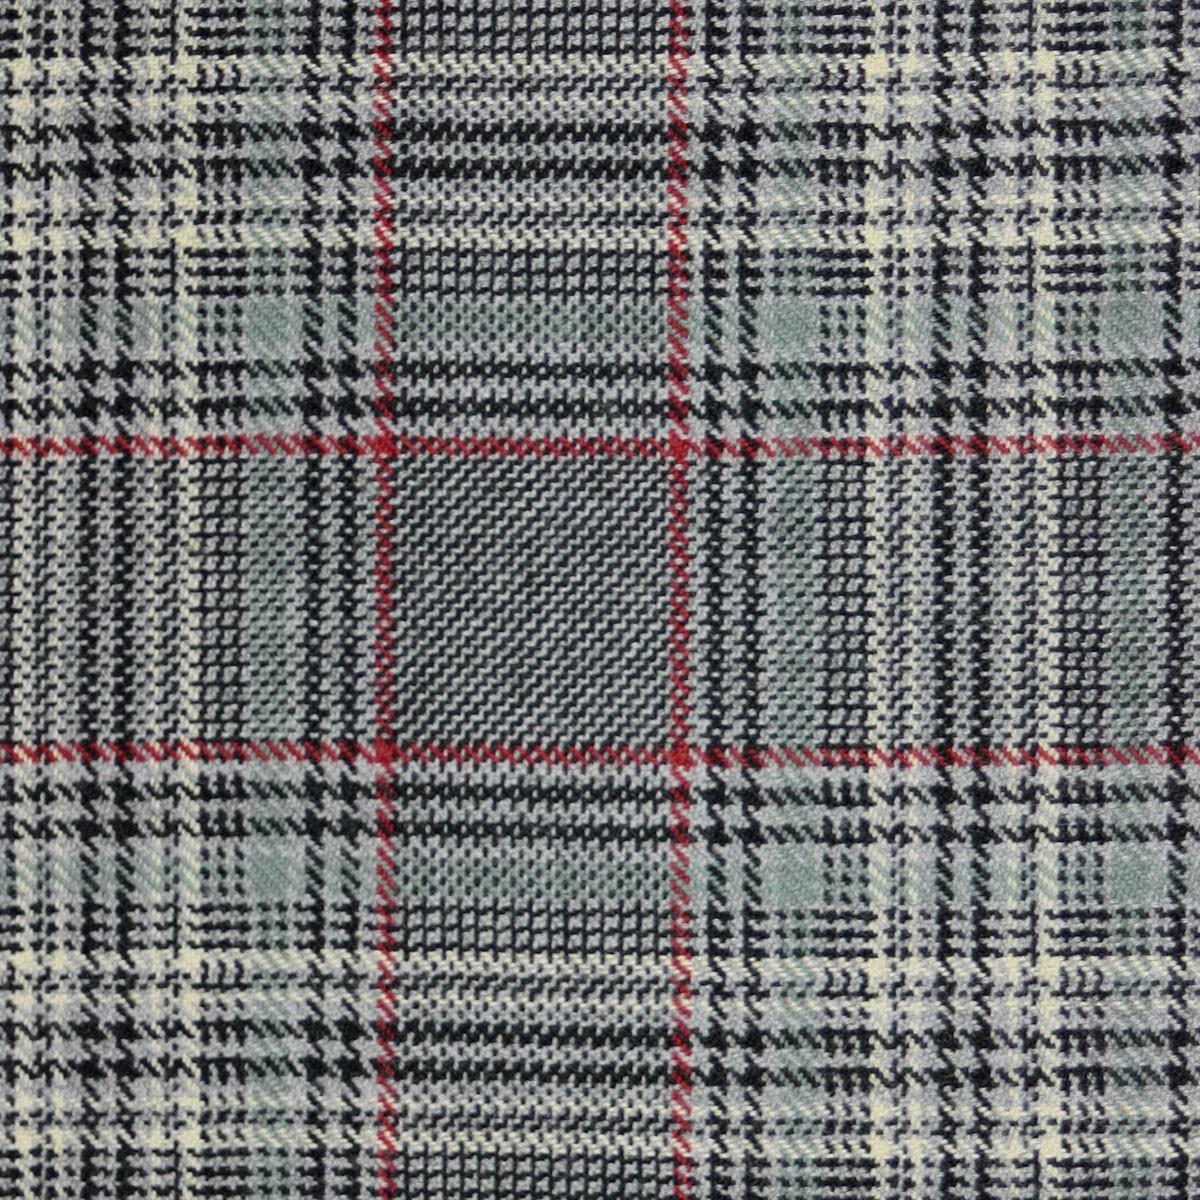 Plockton Check Tweed Light Weight Fabric-Front